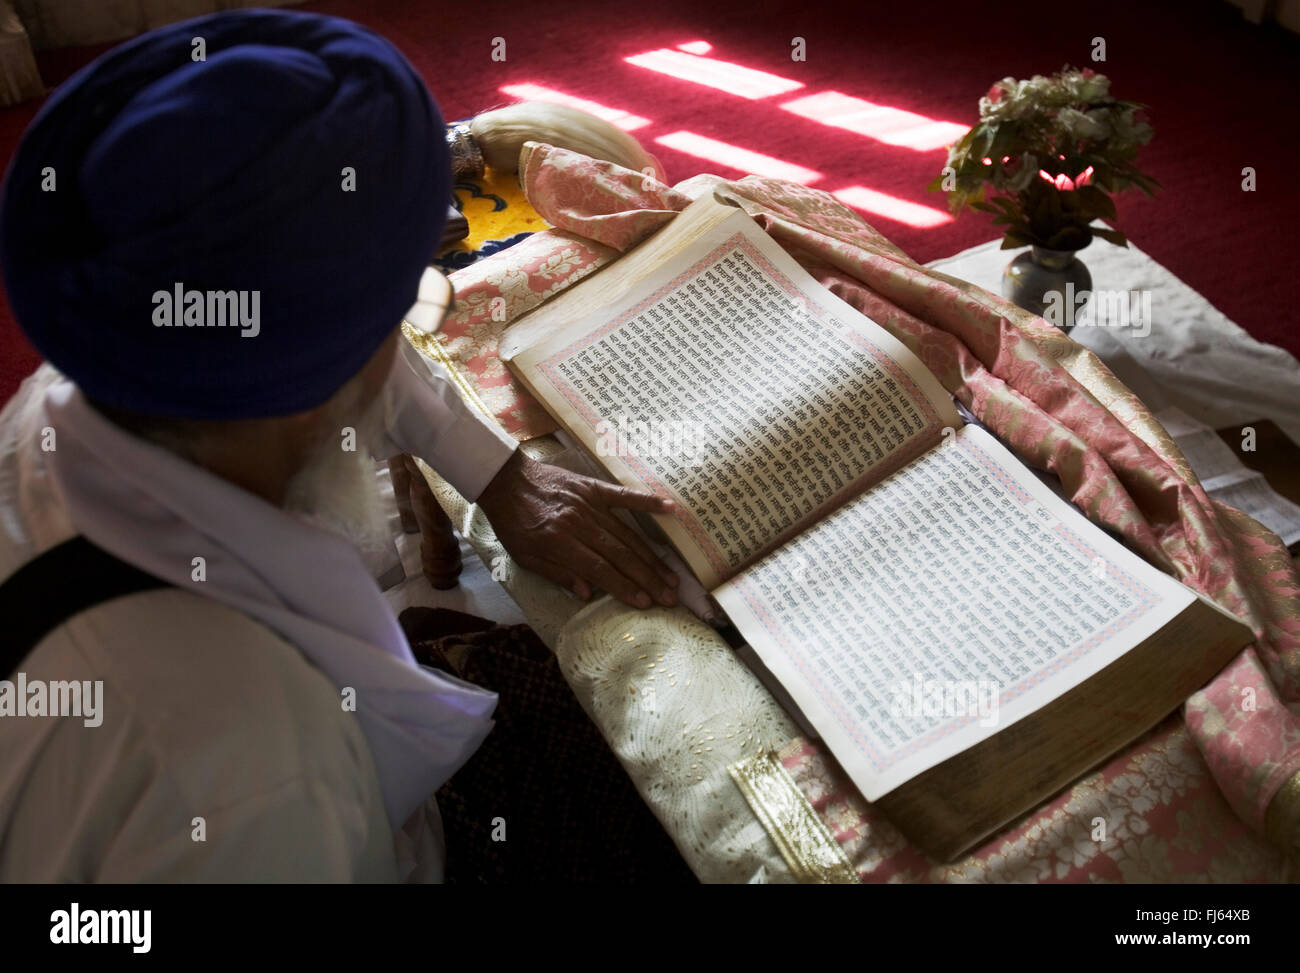 Sikh priest reading scripture, India - Stock Image